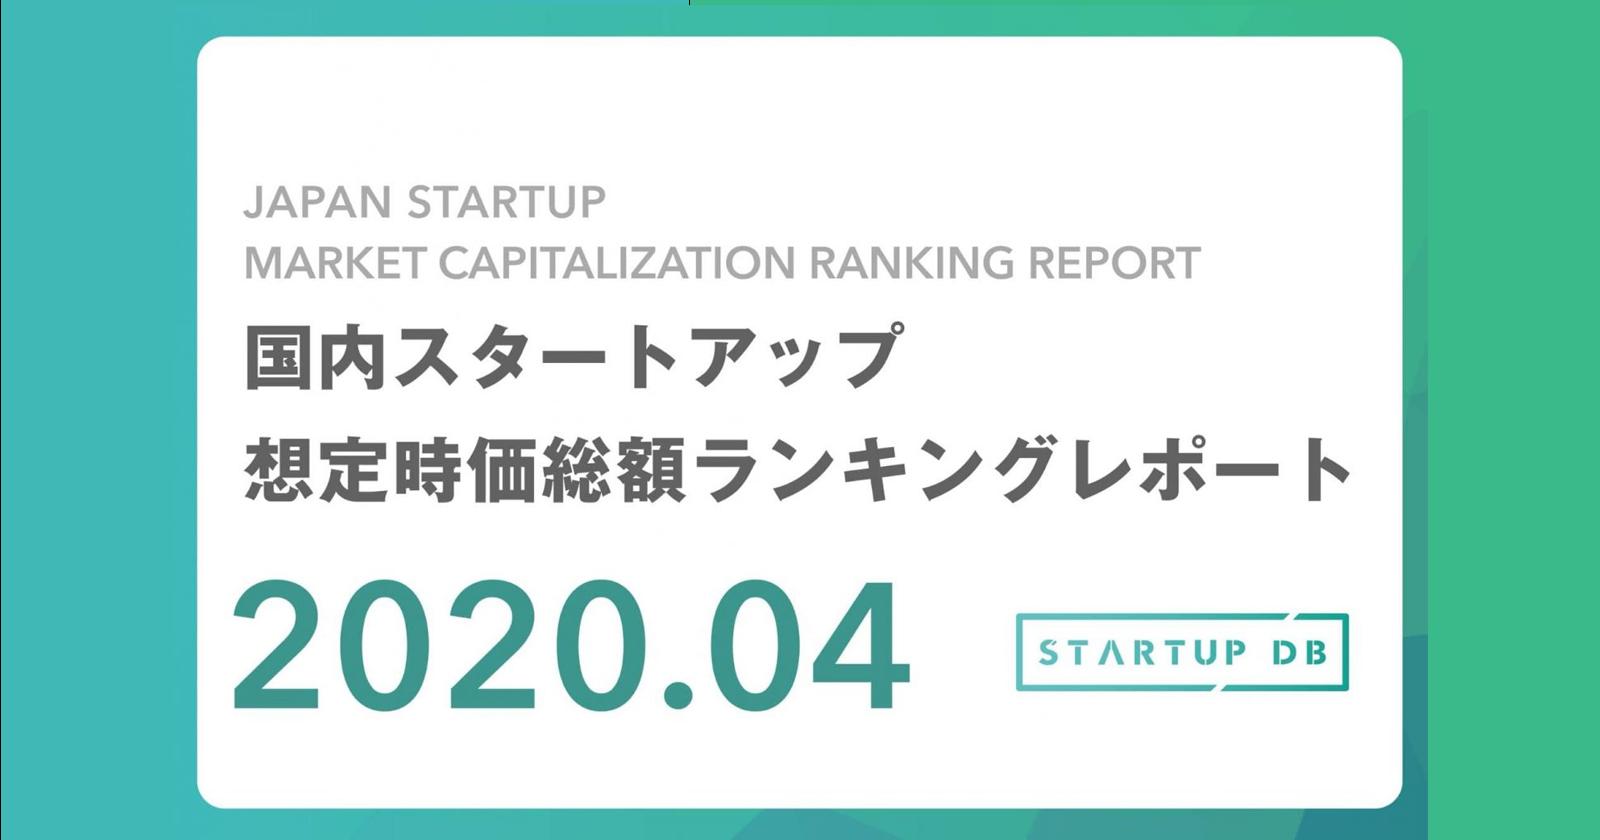 【STARTUP DB】調査結果 国内スタートアップ想定時価総額ランキング(2020年4月)   先月からの順位の変動はなし、ランキング上位企業の新型コロナウイルス対応に関して